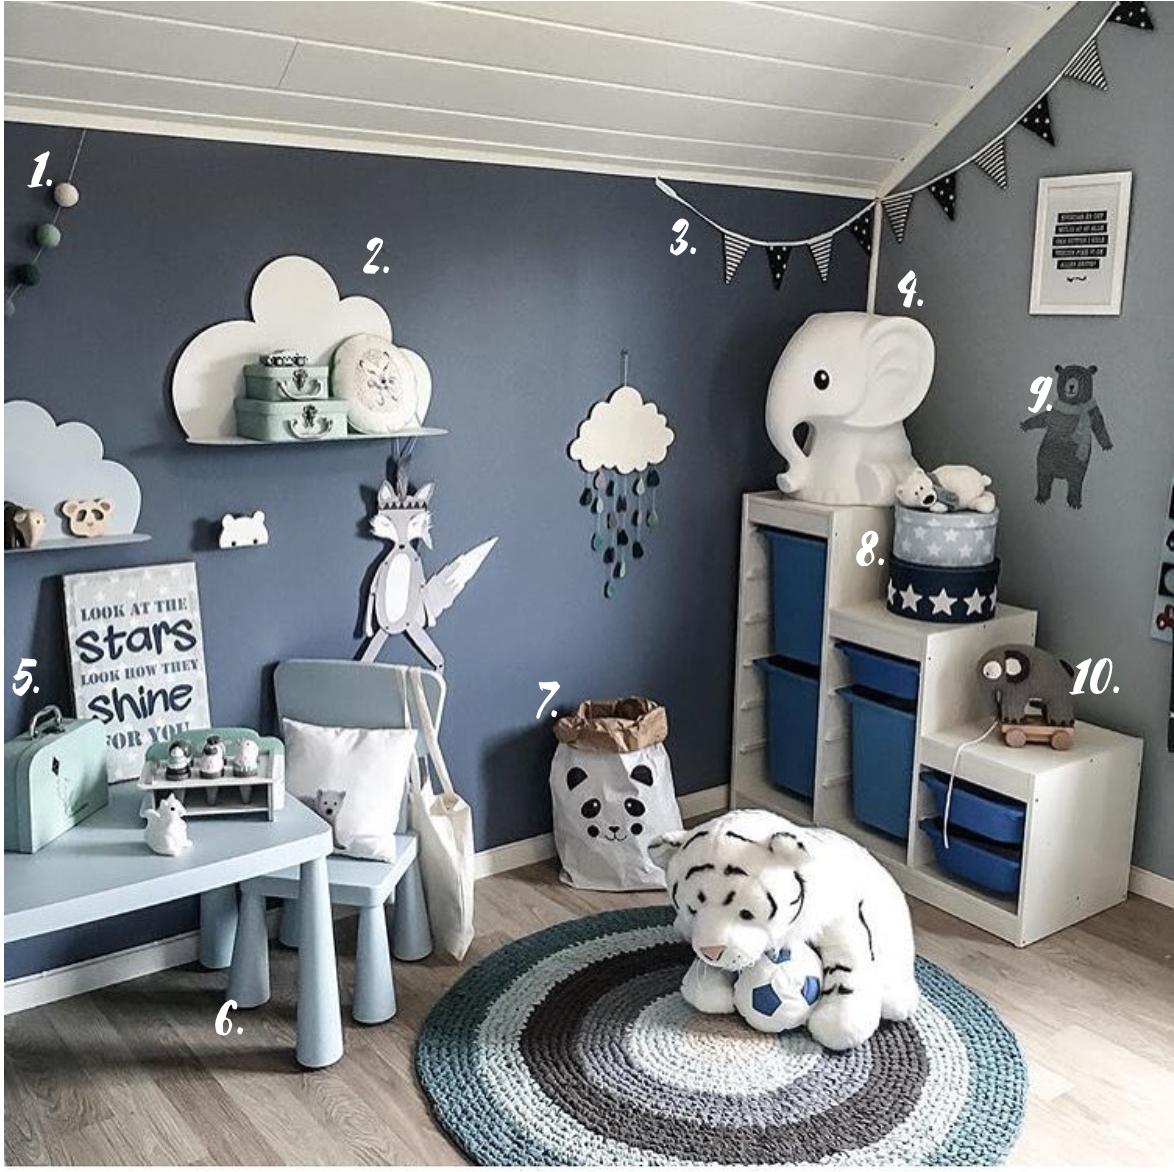 décoration chambre garçon bleu gris